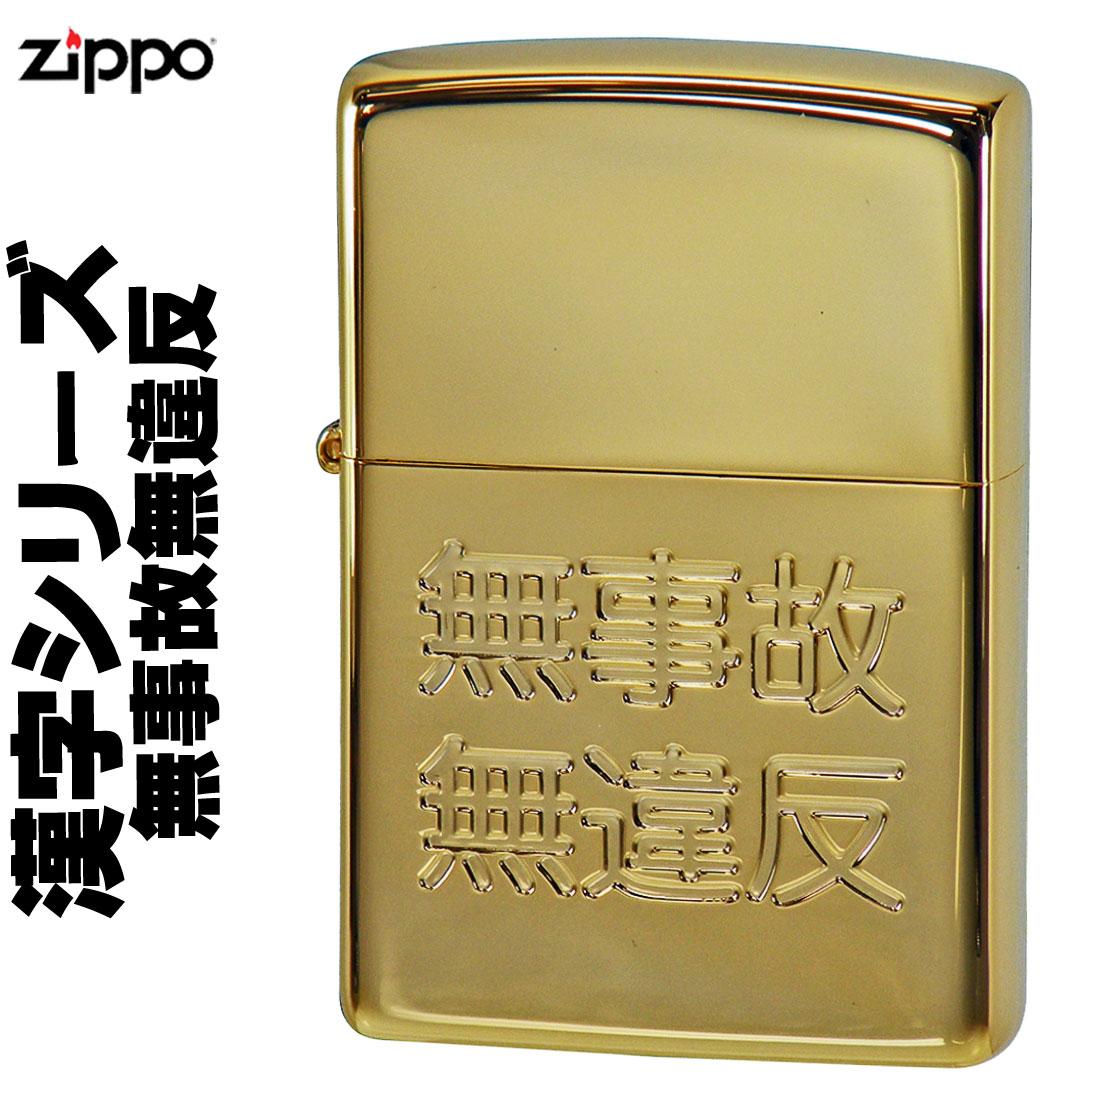 ZIPPO/漢字シリーズ 無事故無違反 金ミラー画像